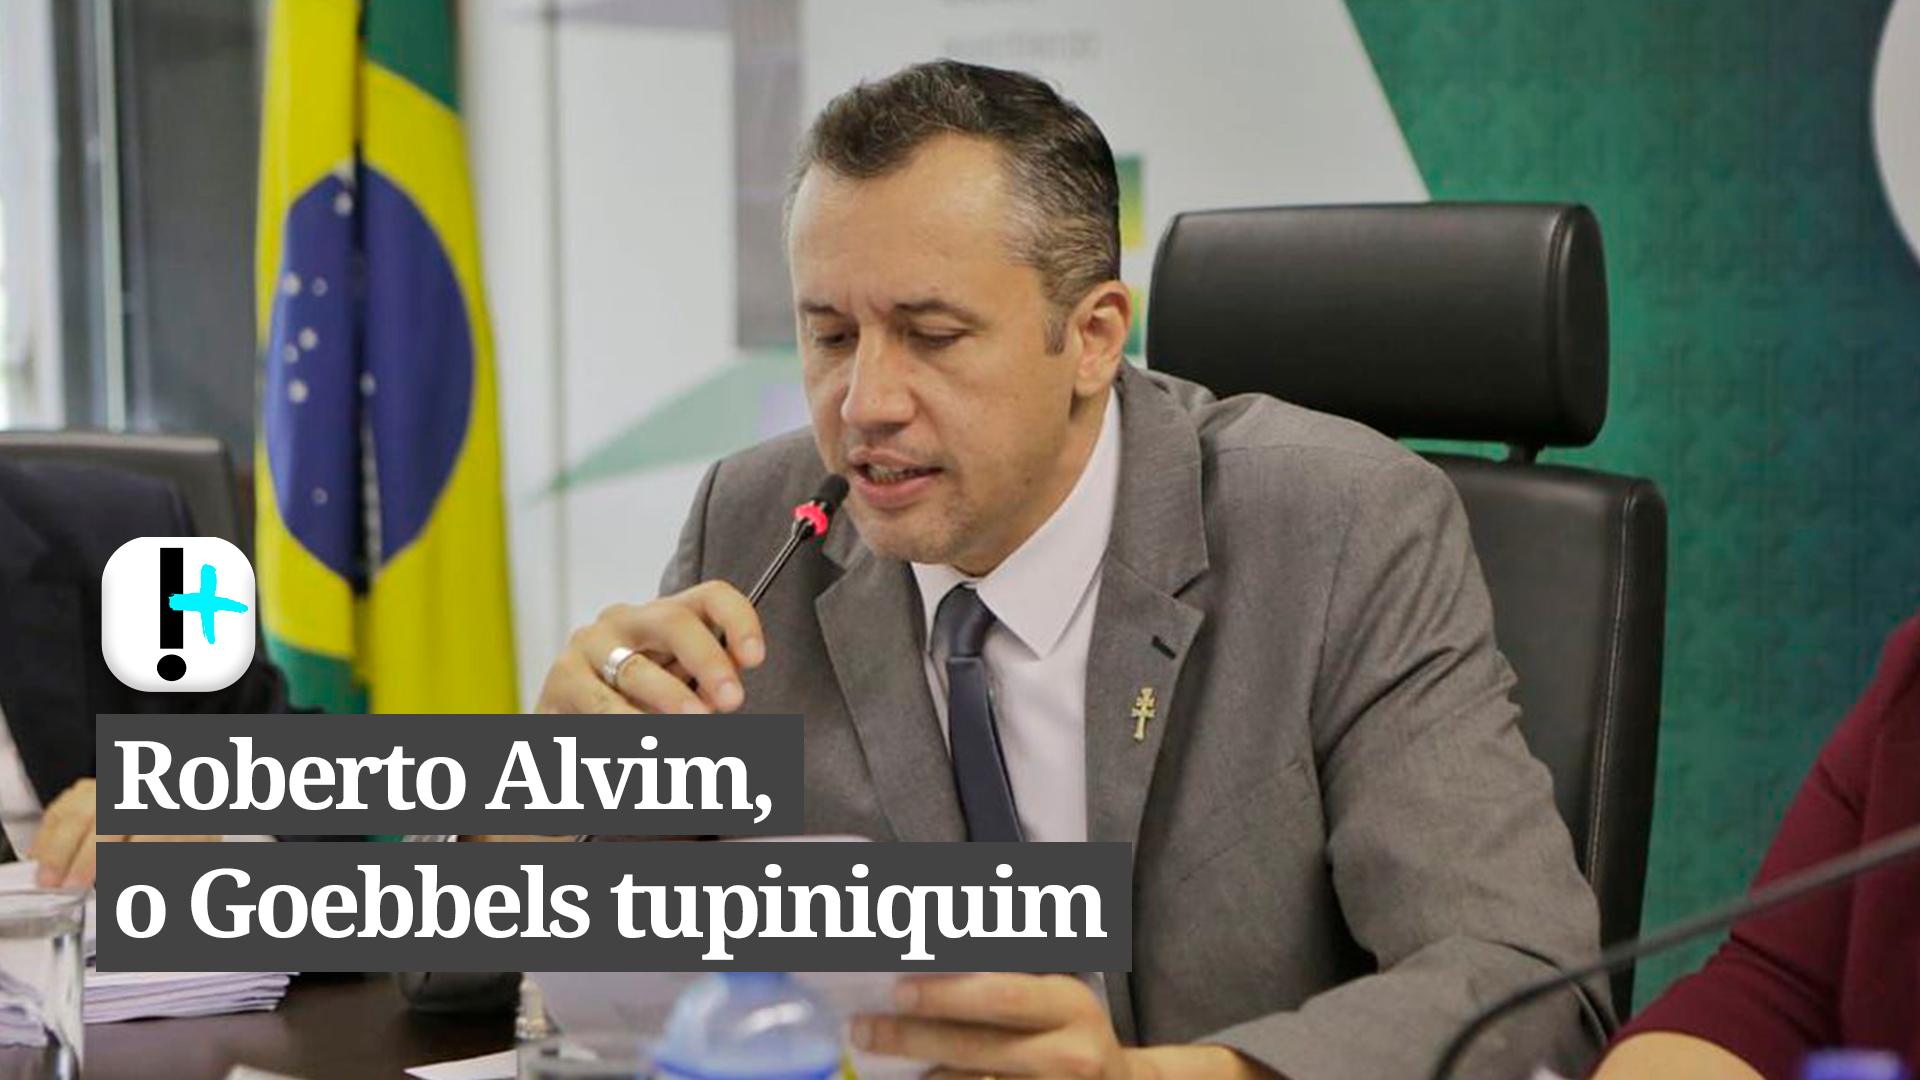 Vídeo: Roberto Alvim, o Goebbels tupiniquim